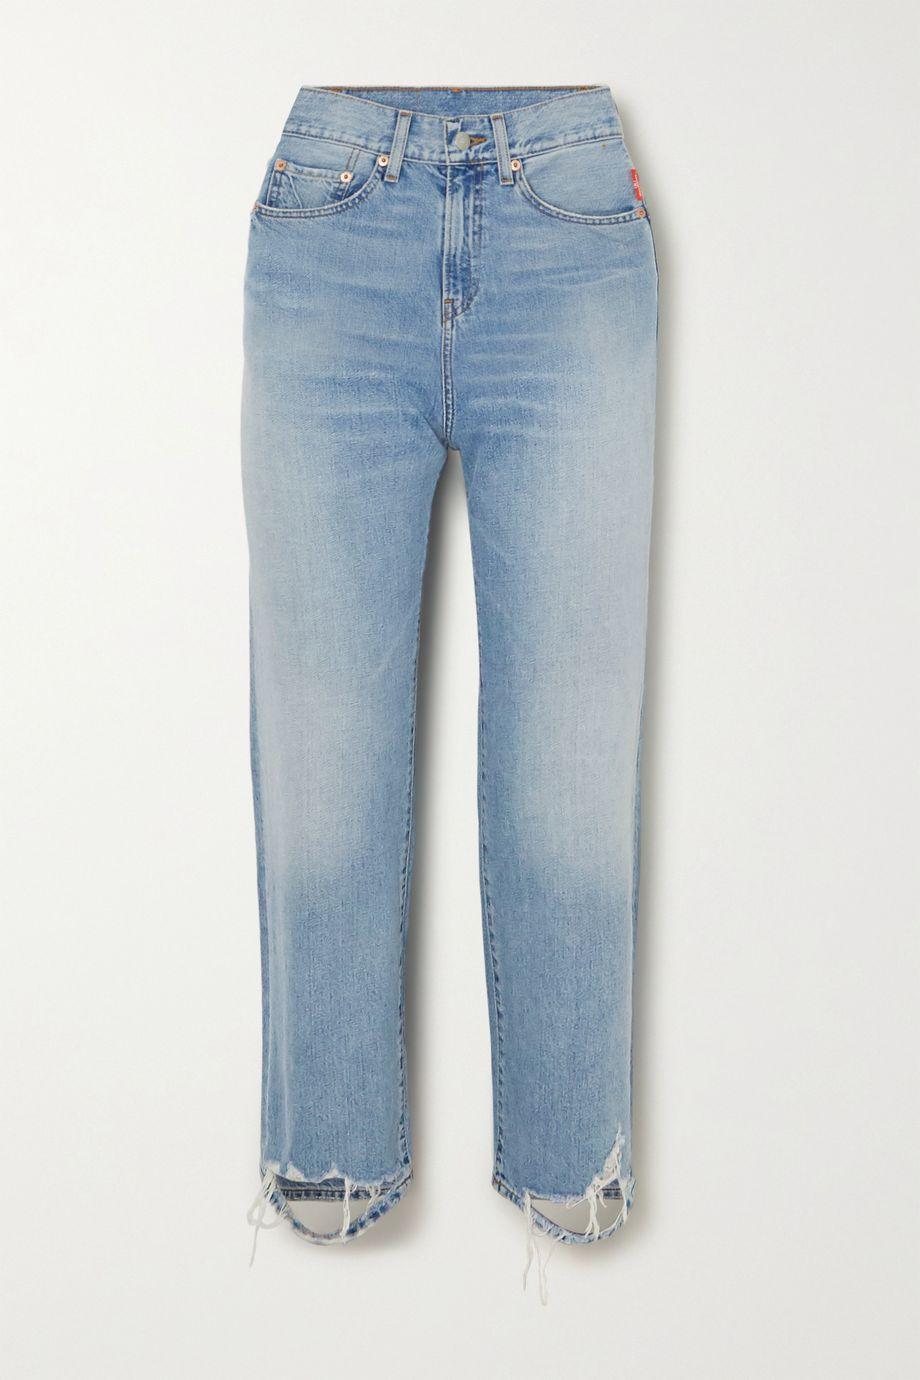 Denimist Pierce cropped distressed high-rise straight-leg jeans